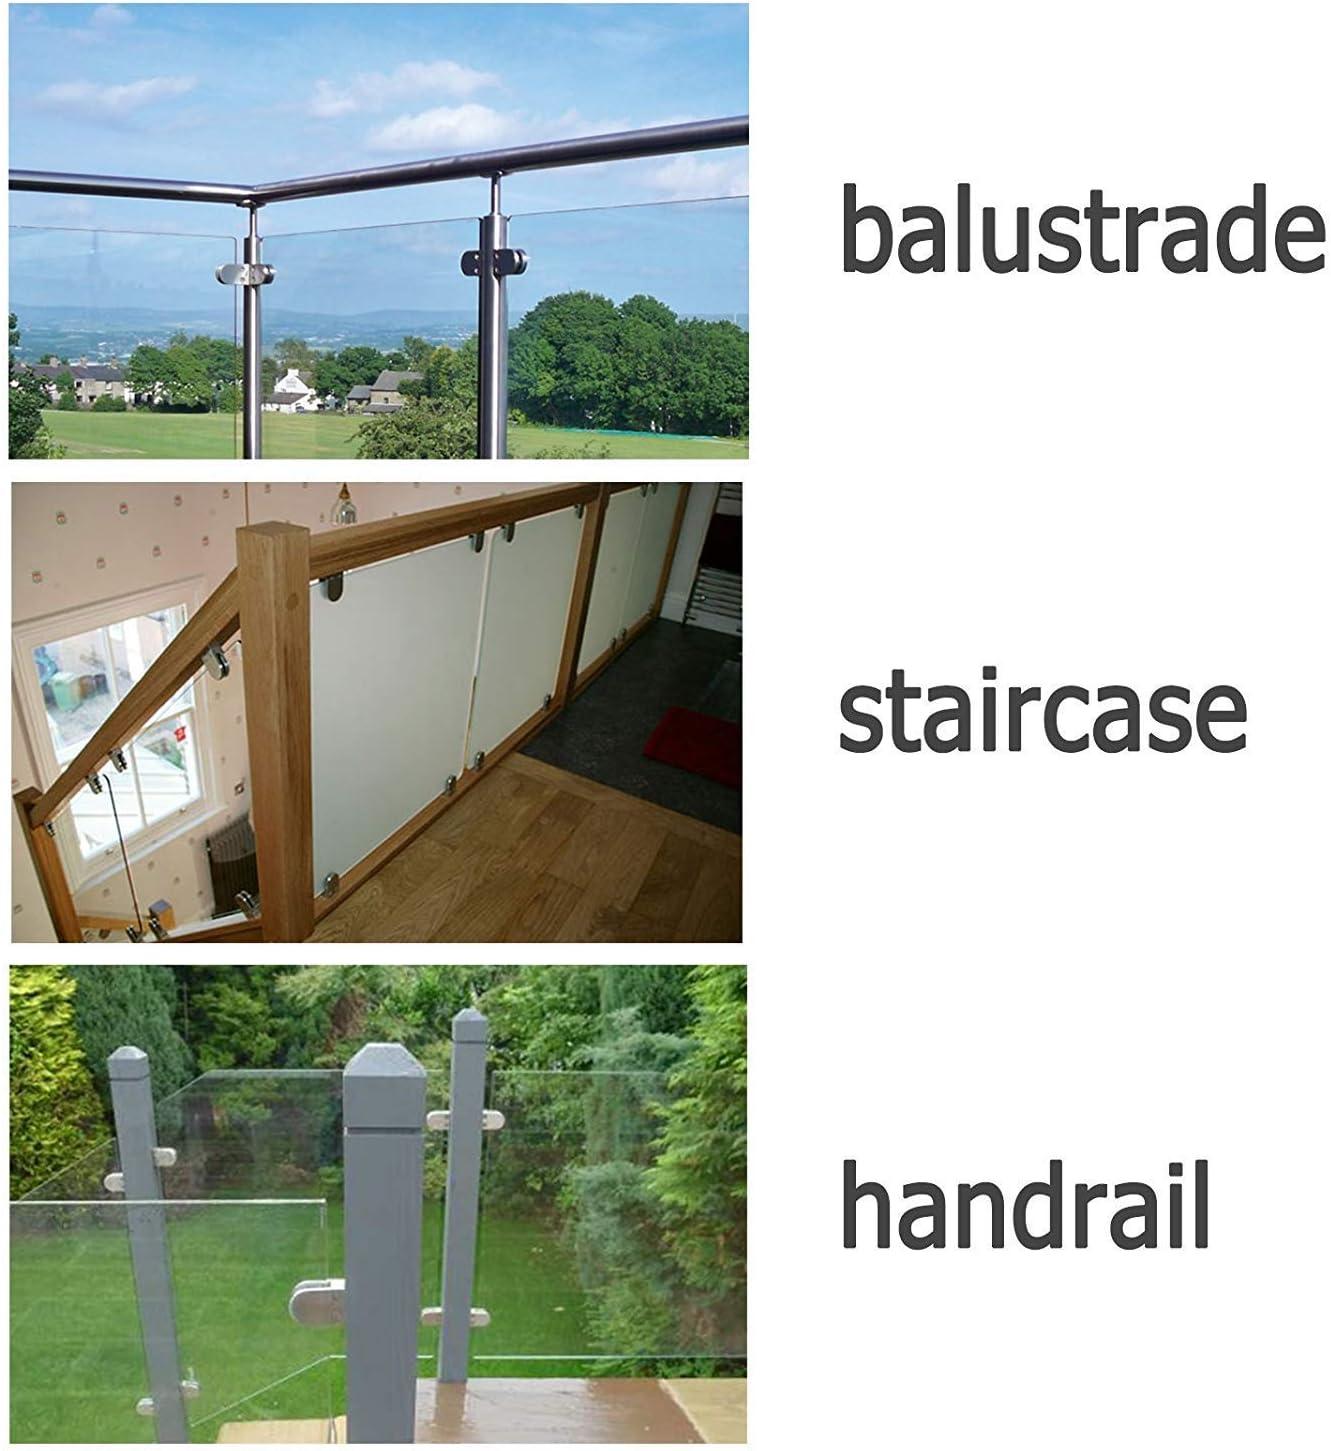 Dos plat Support en verre rampe rampe Support en verre en acier inoxydable 304 Pour escalier Support r/églable